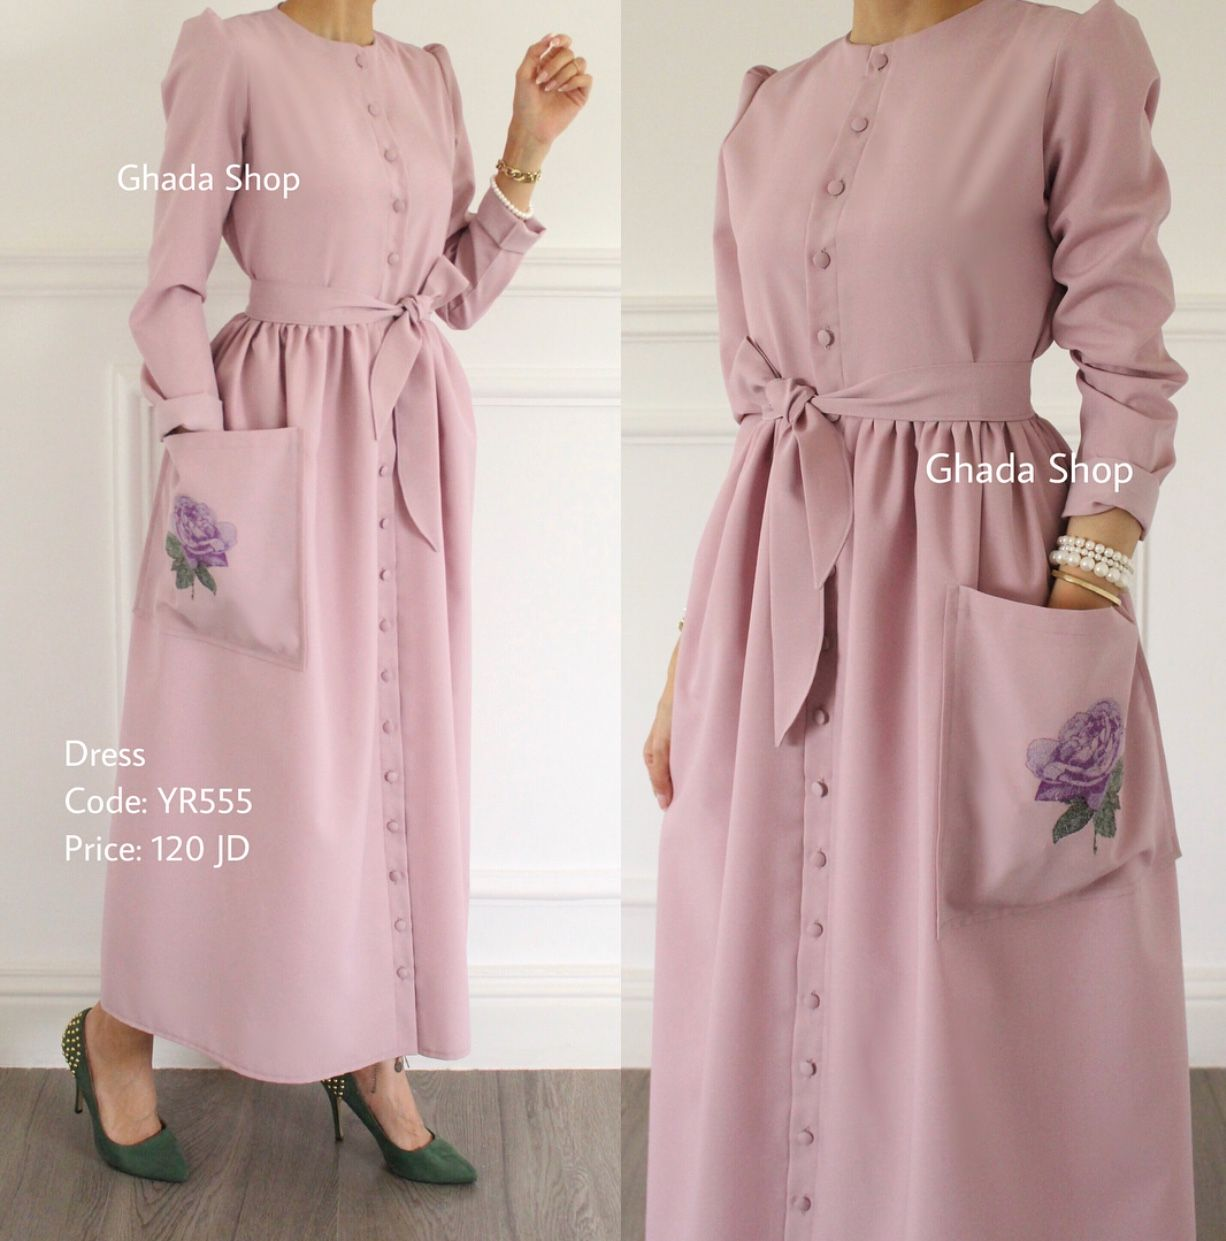 Elbise 2019 Model Mutevazi Moda Elbise Basortusu Modasi